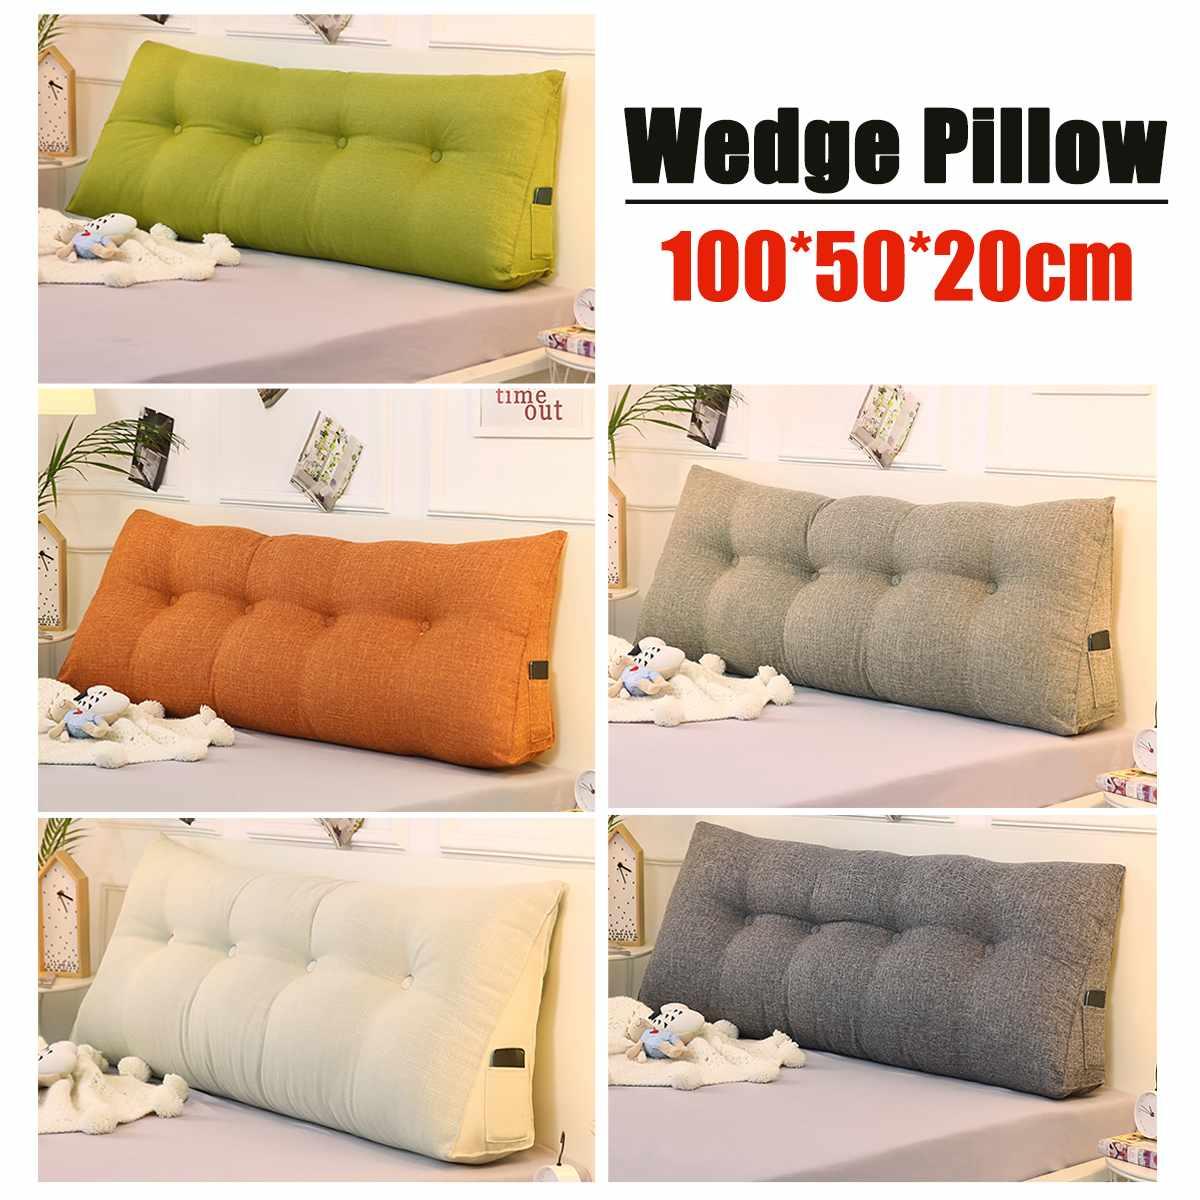 headboard pillow wedge shape back